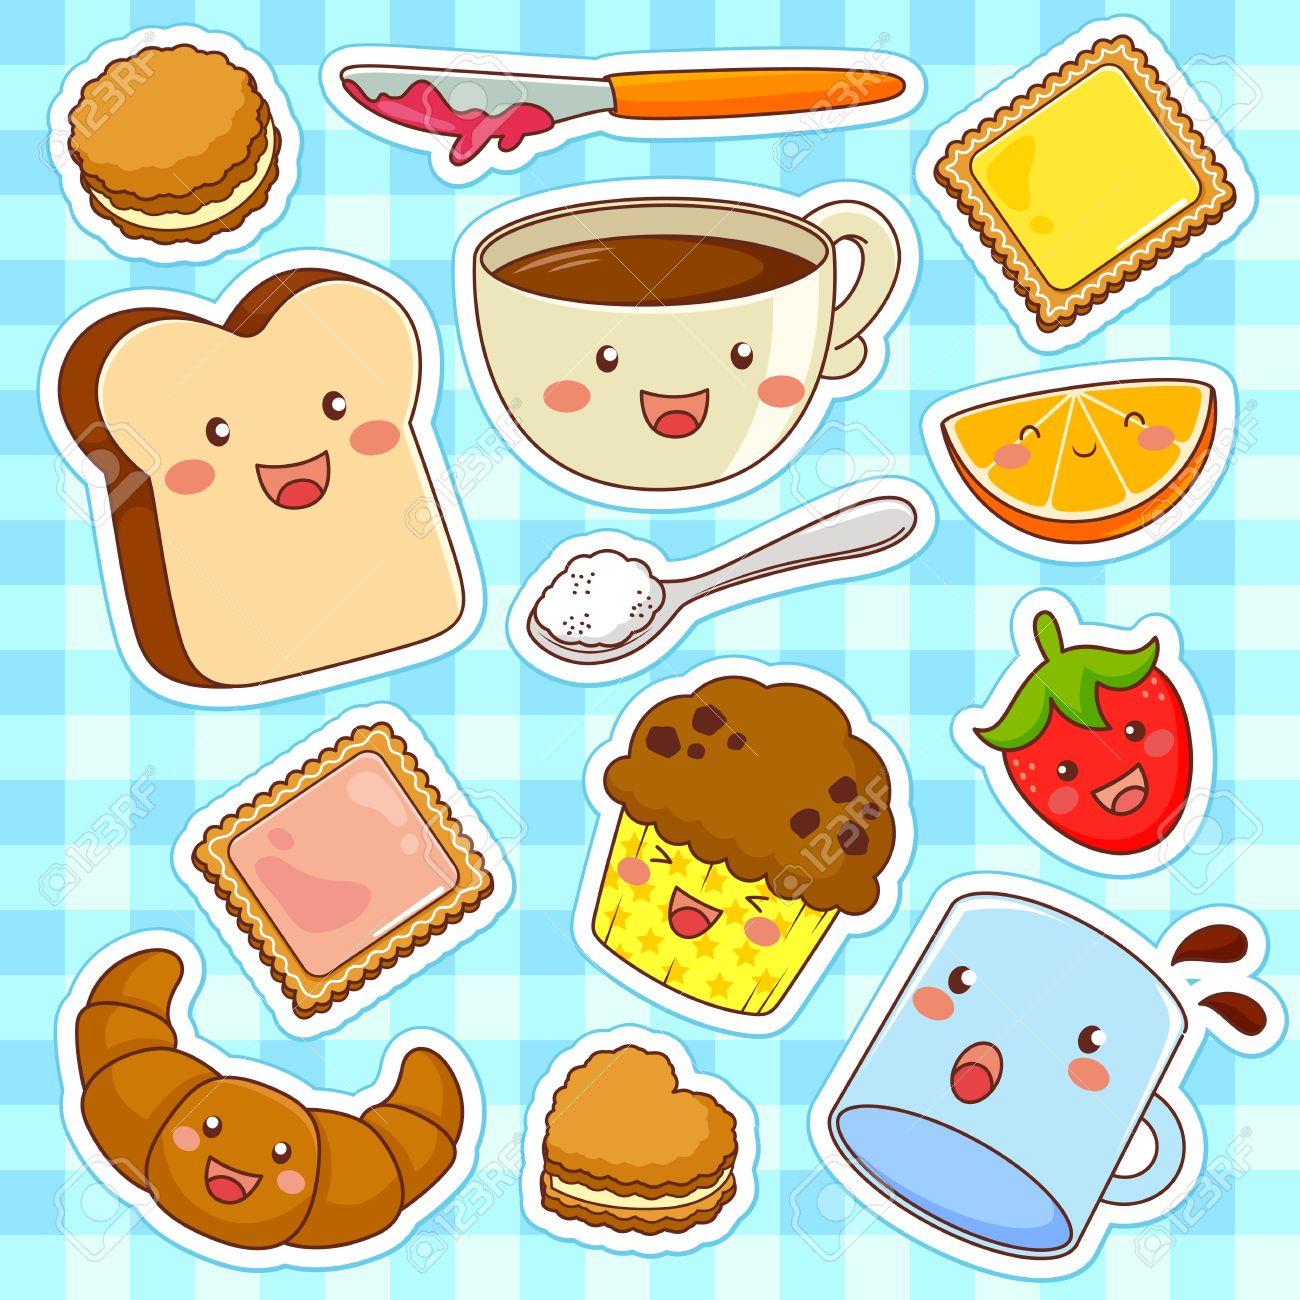 39495869-cute-kawaii-style-cartoon-foods.jpg